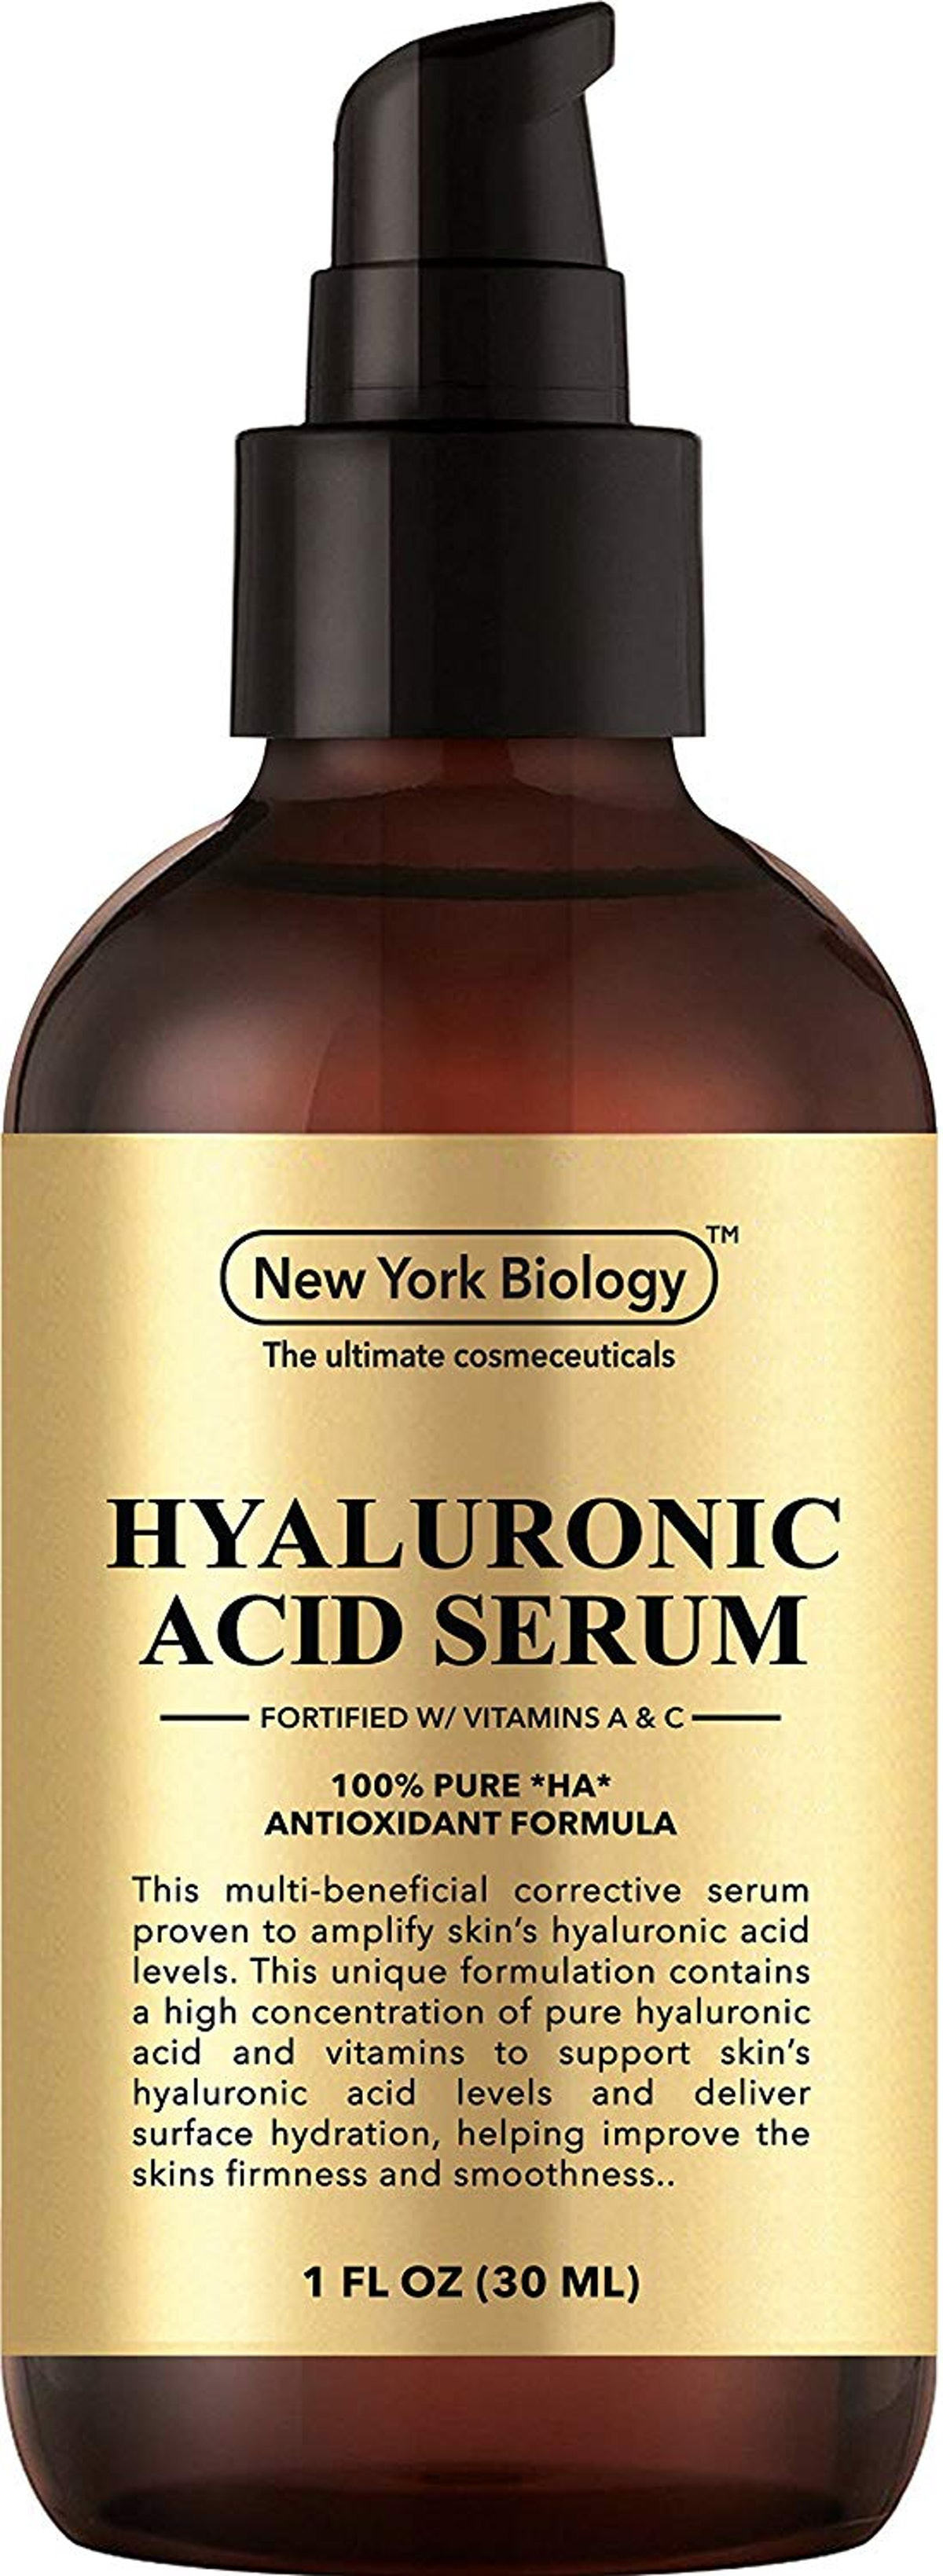 New York Biology Hyaluronic Acid Serum